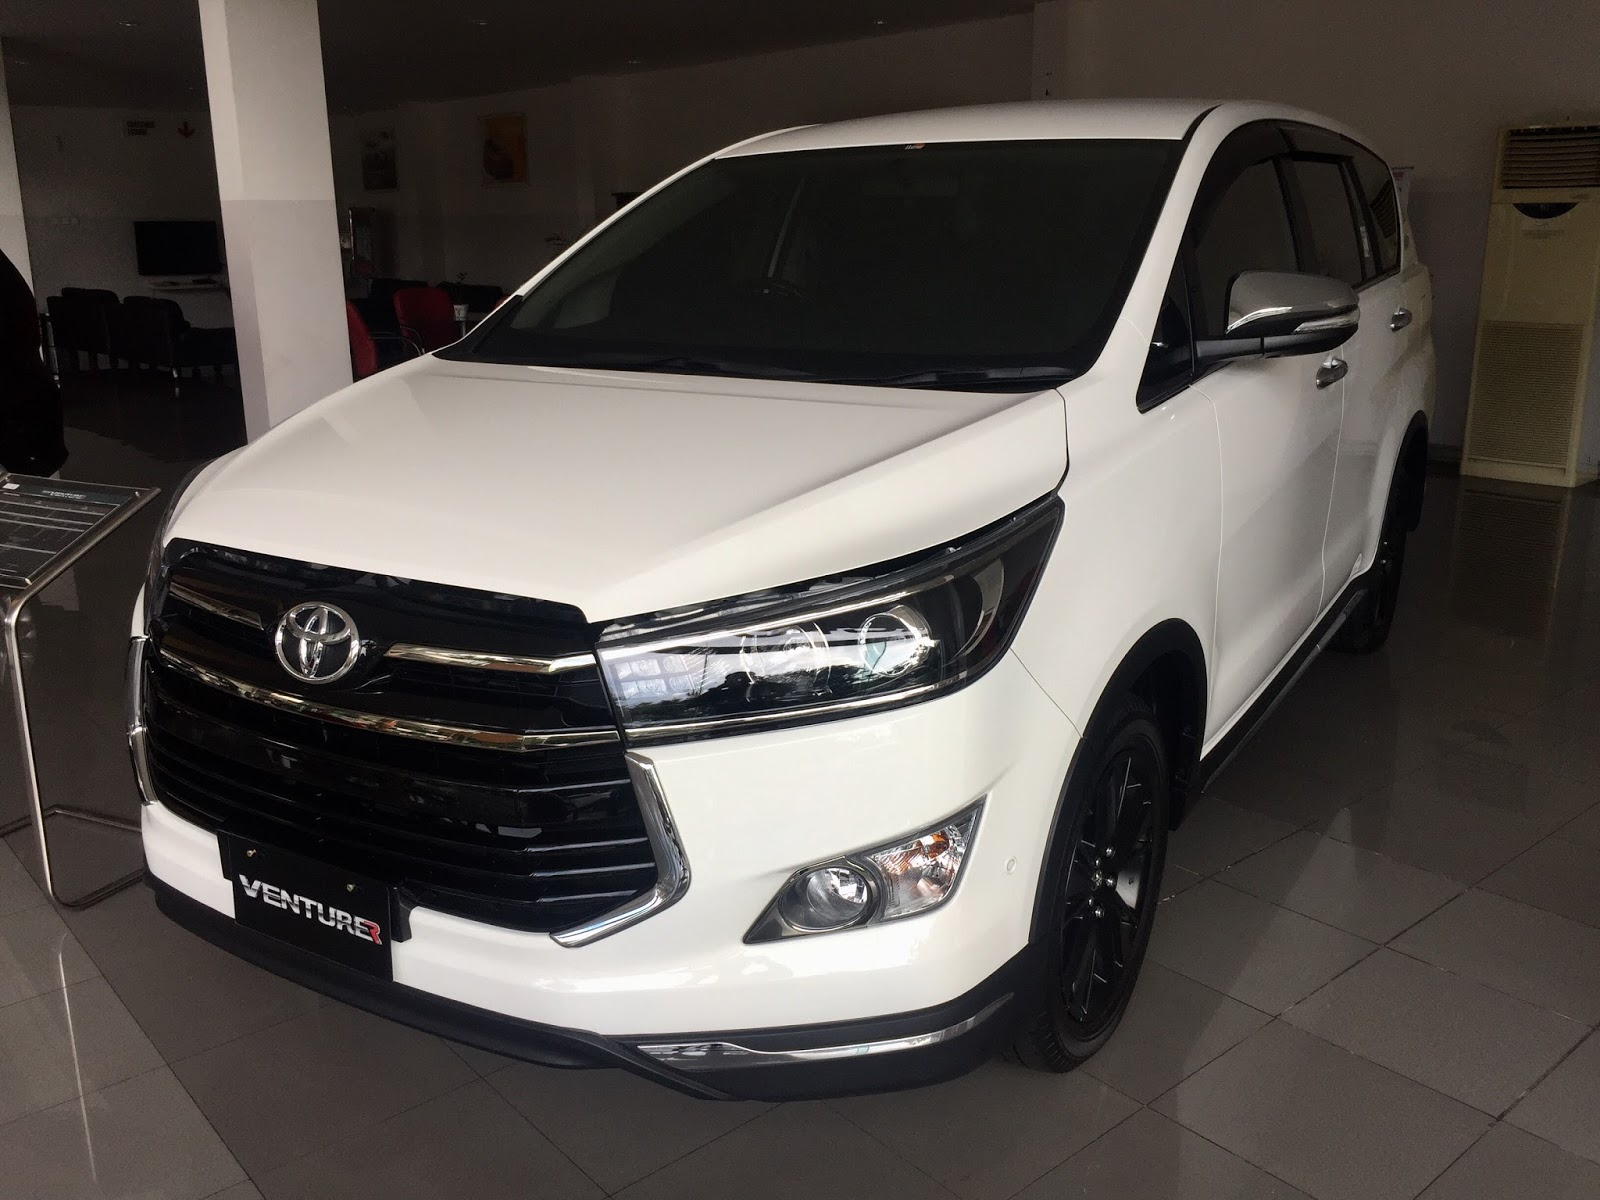 Perbedaan New Innova Dan Venturer Harga Bumper Depan Grand Veloz Terbaru Toyota Quotventurer Quot Jemursari Maret 2017